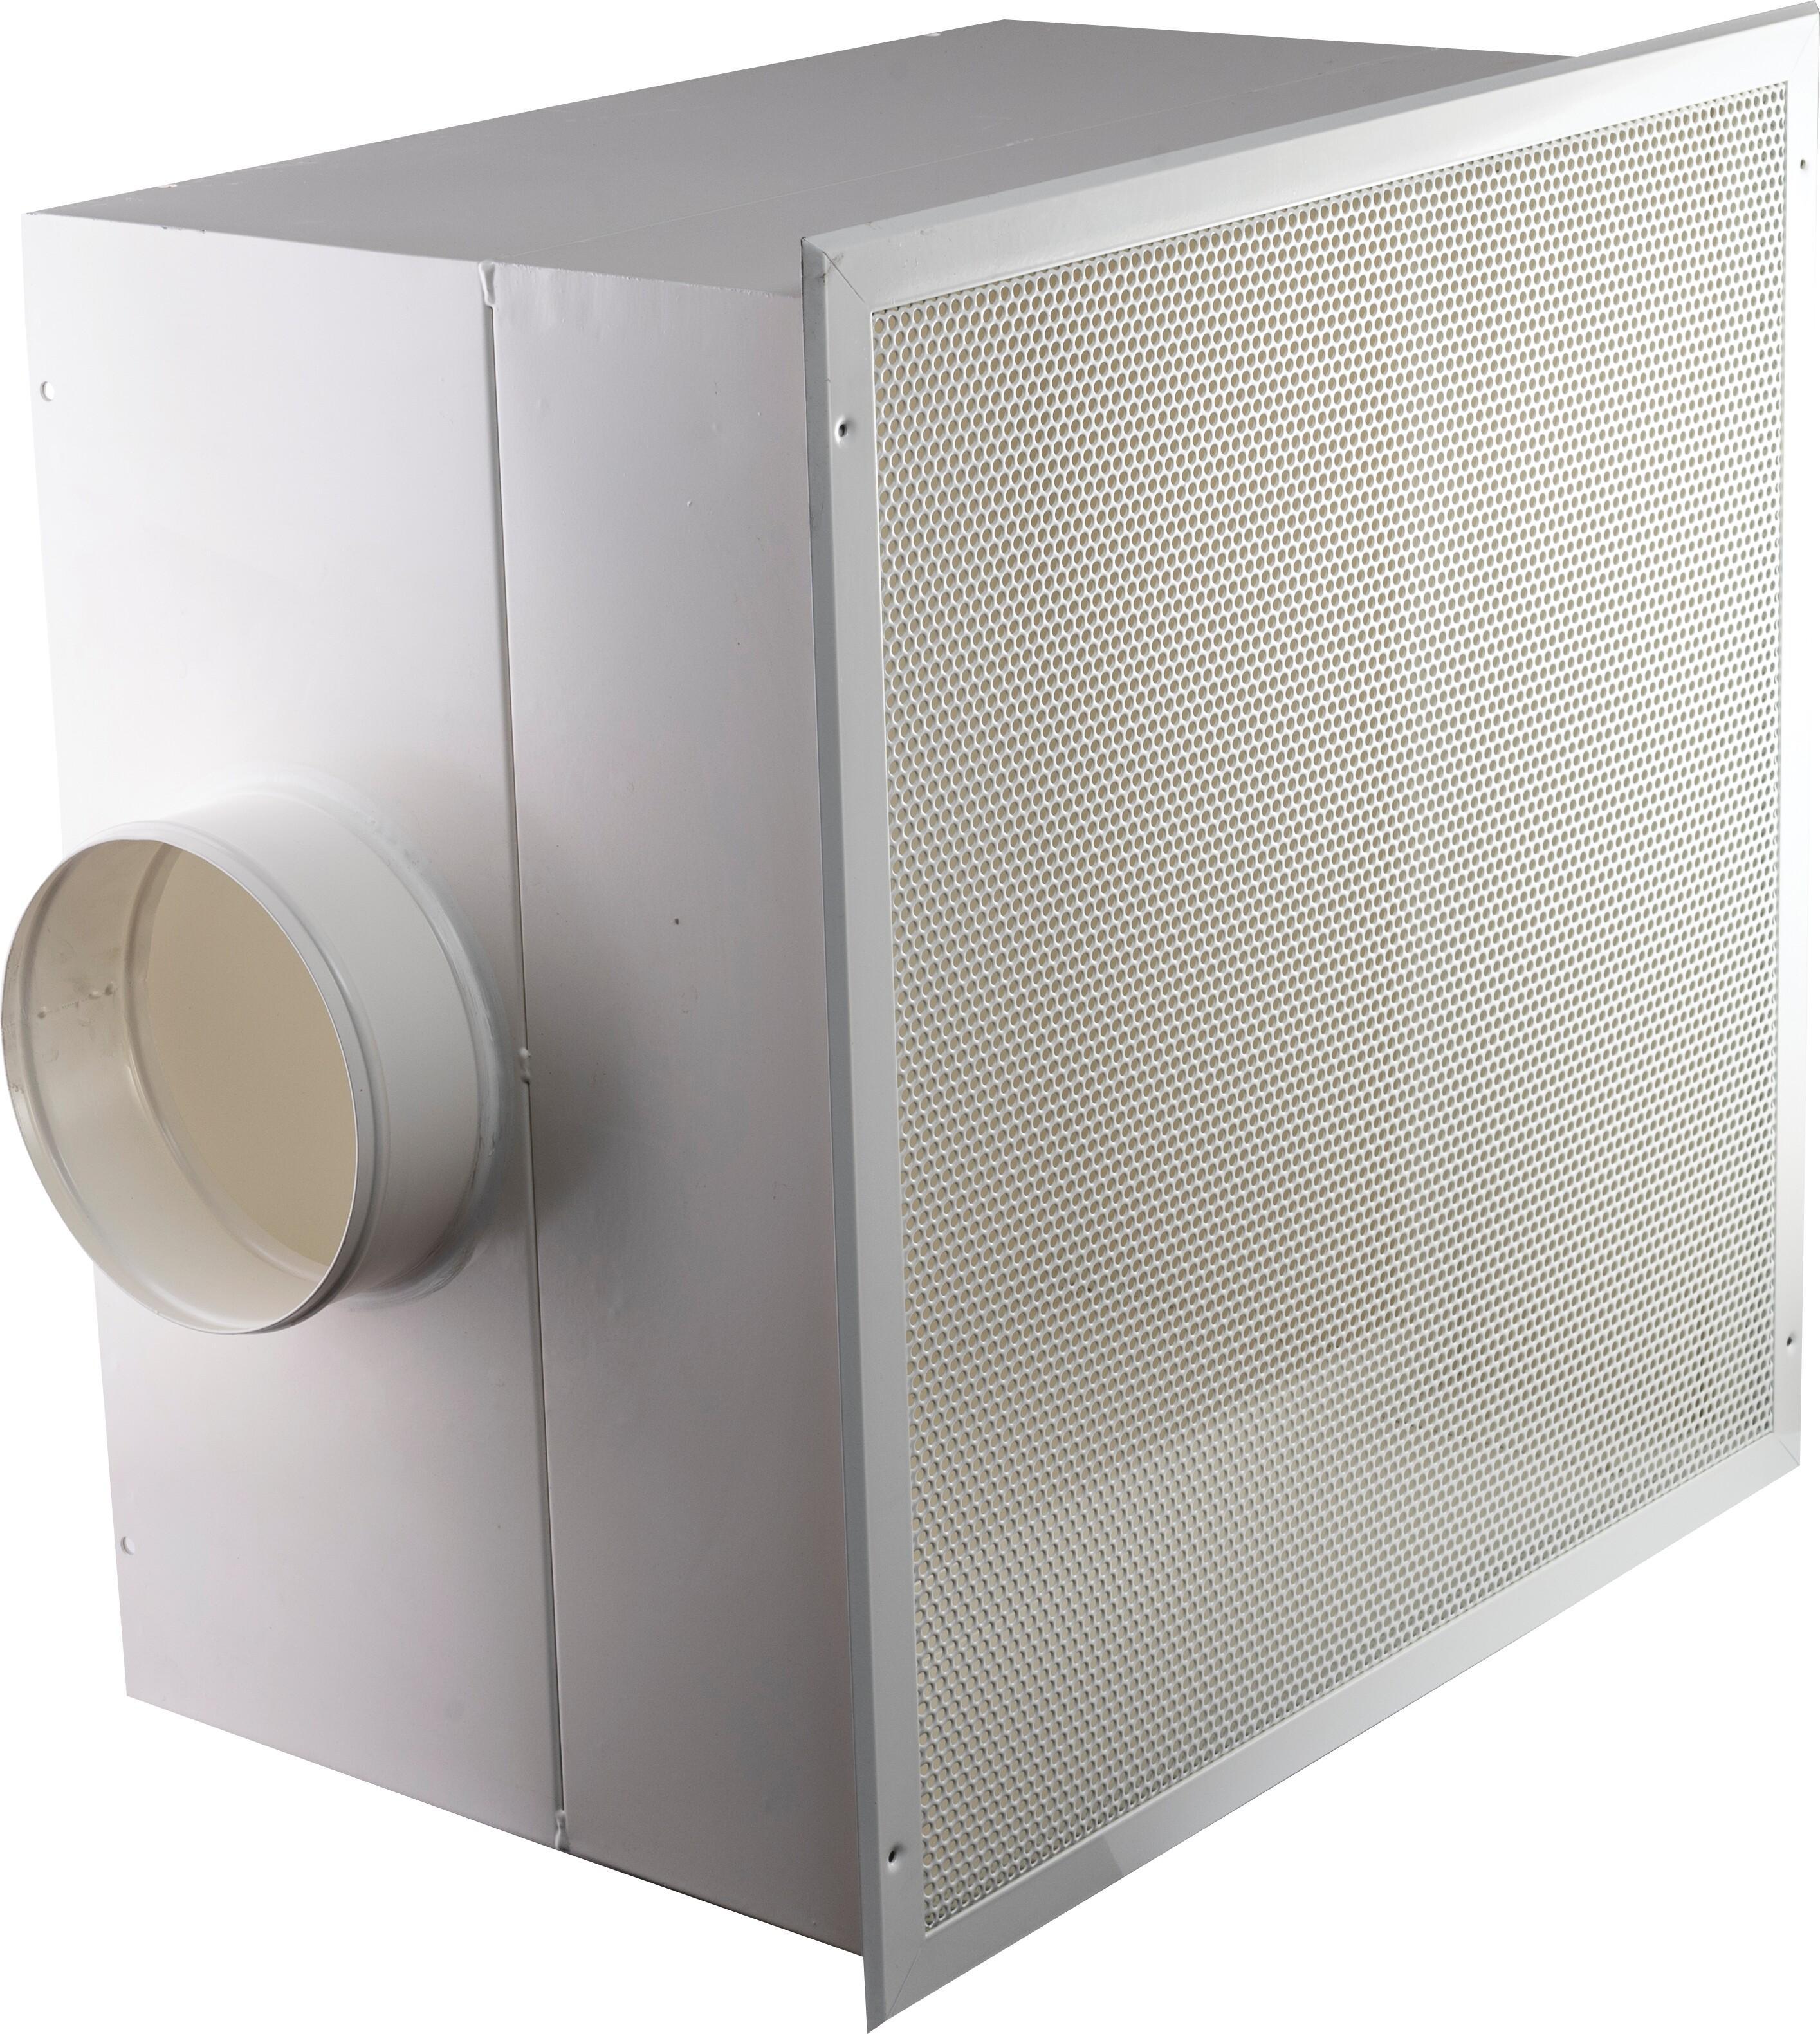 Terminal HEPA filter boxes - Terminal HEPA filter boxes